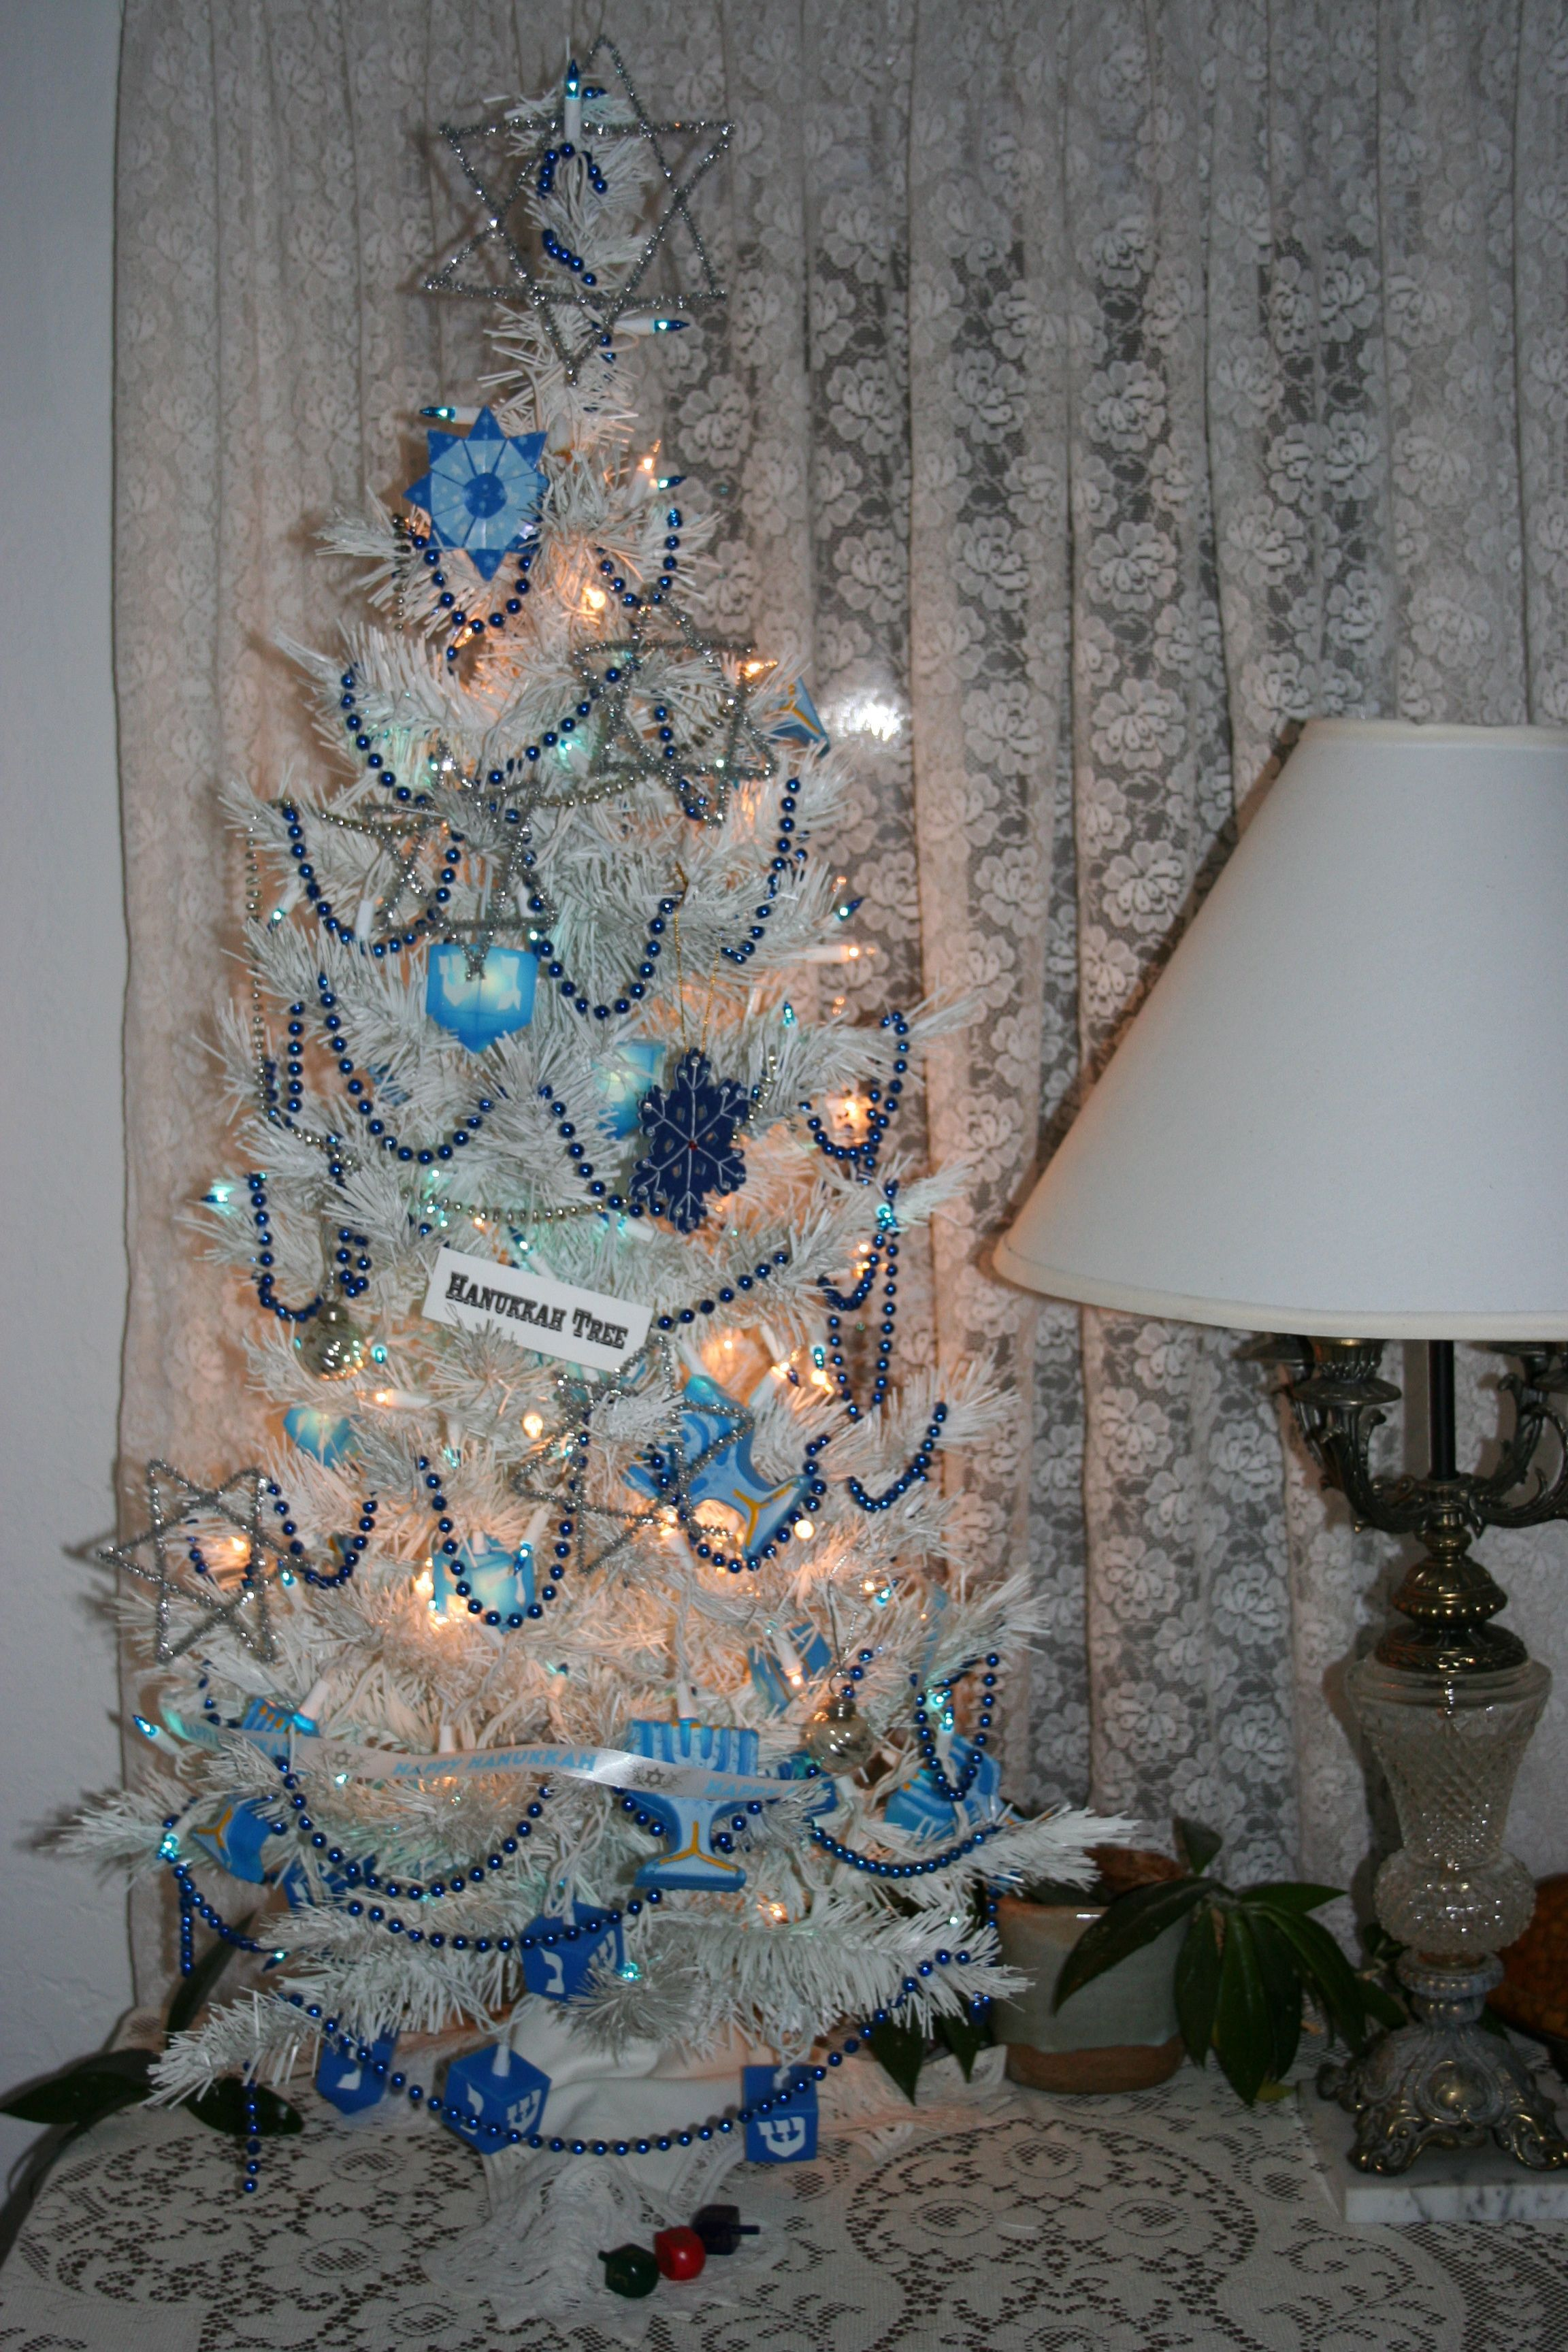 Hanukkah ornaments for a tree - Hanukkah Tree